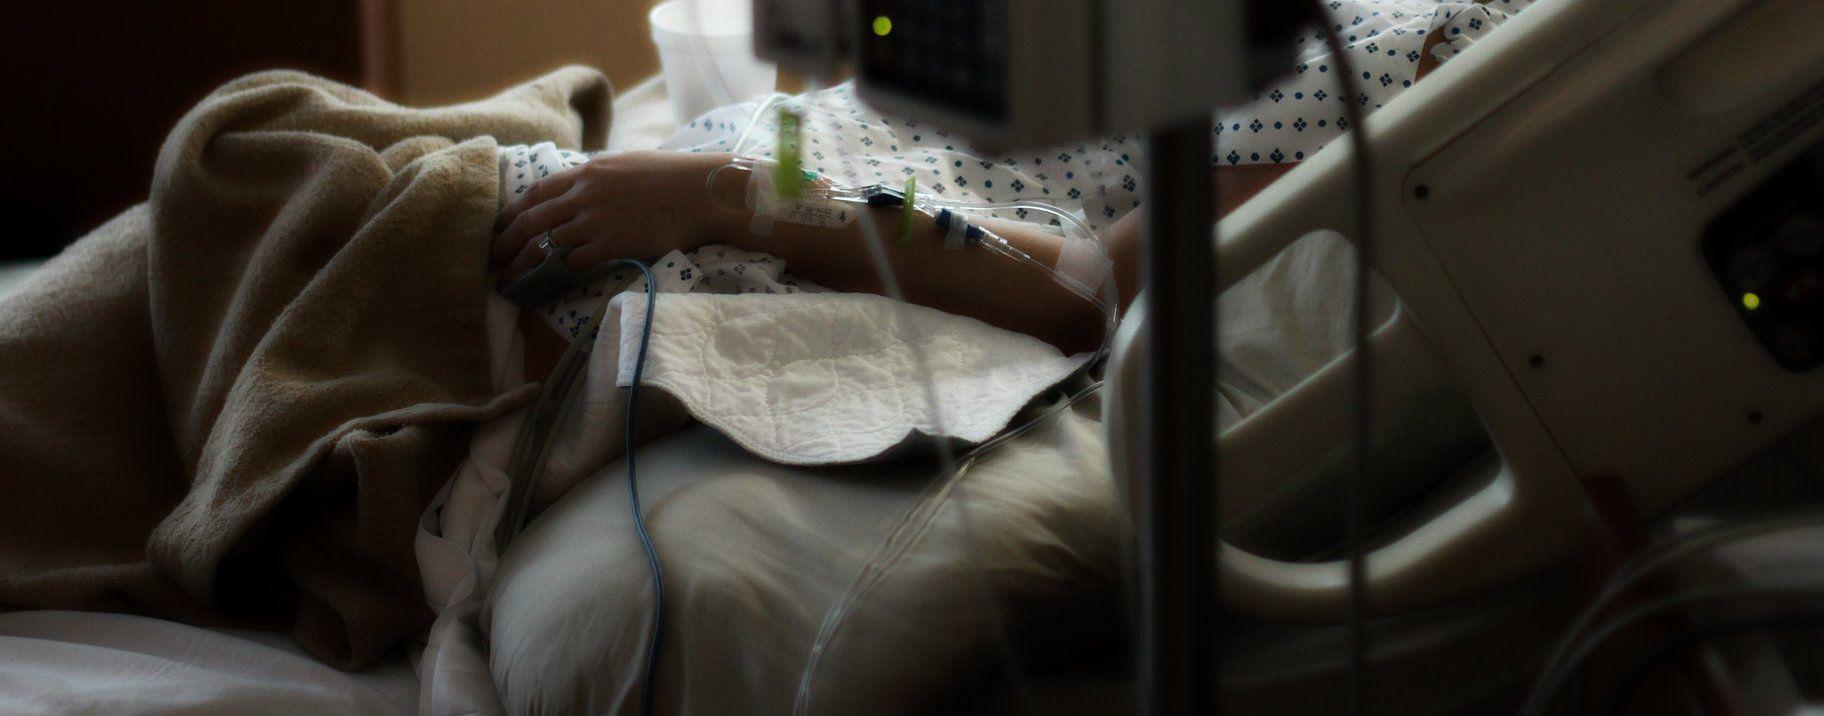 Patienten sterbehilfe aktive passive